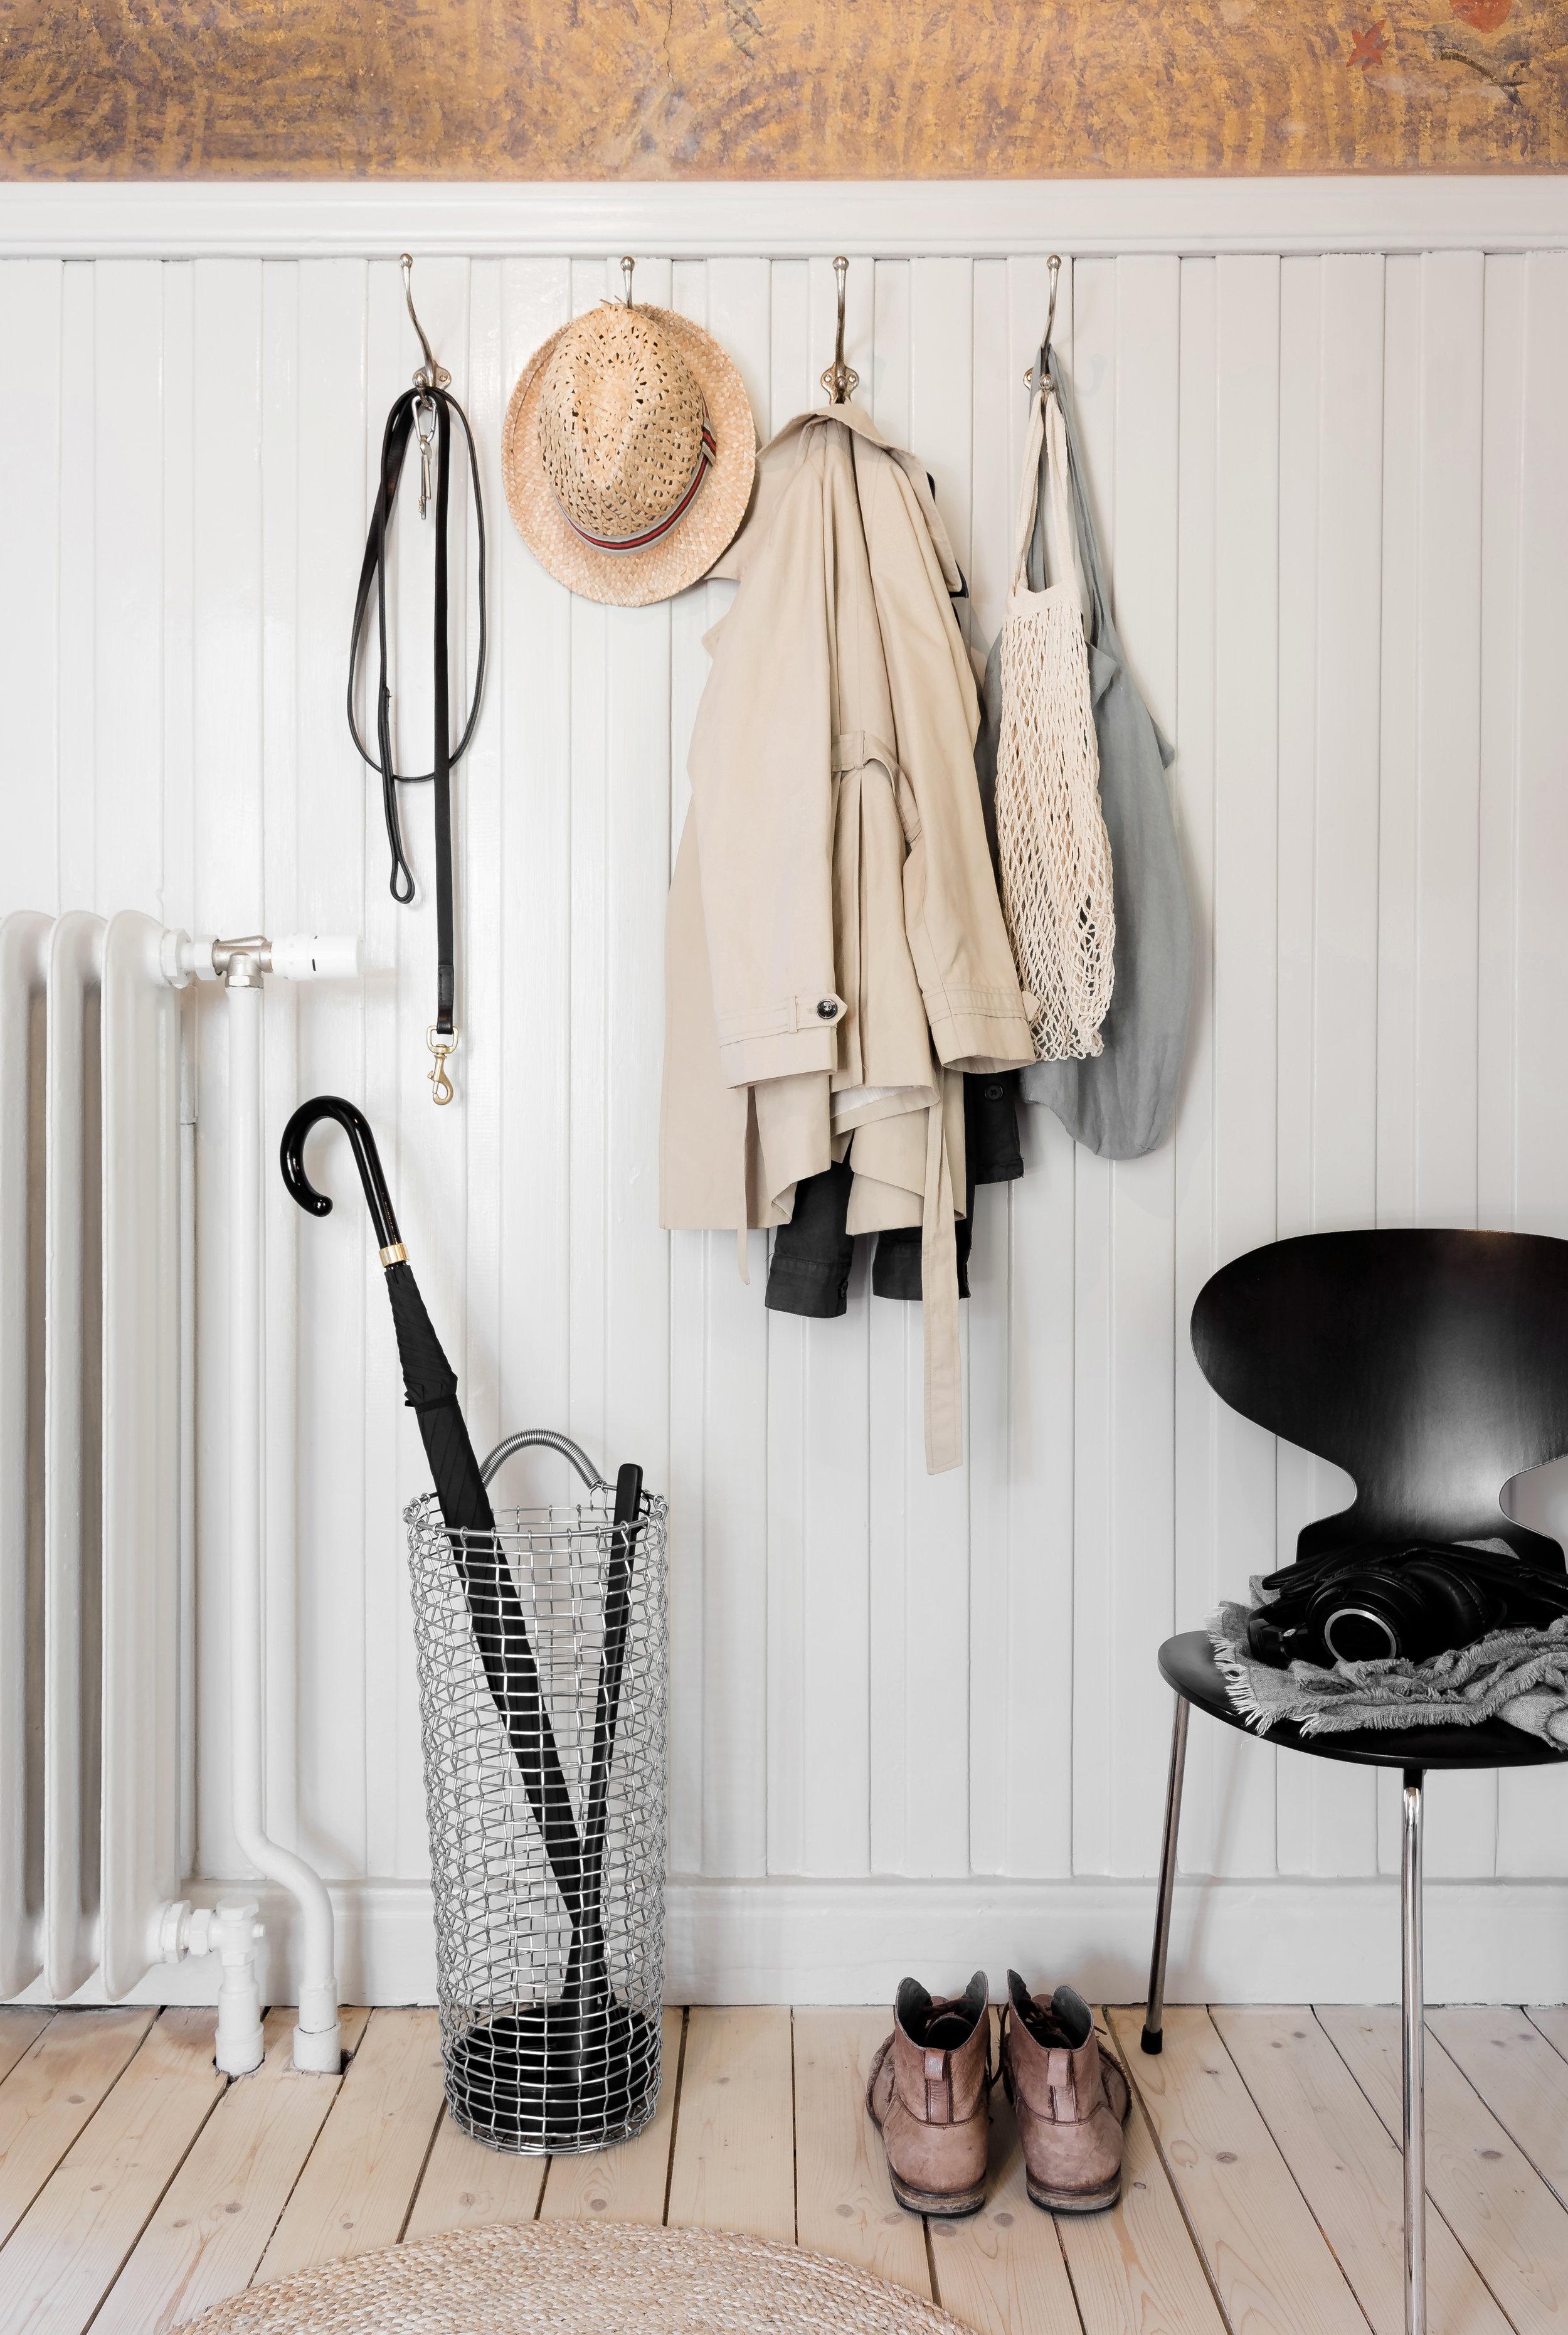 Hallway essentials with Korbo Umbrella Basket